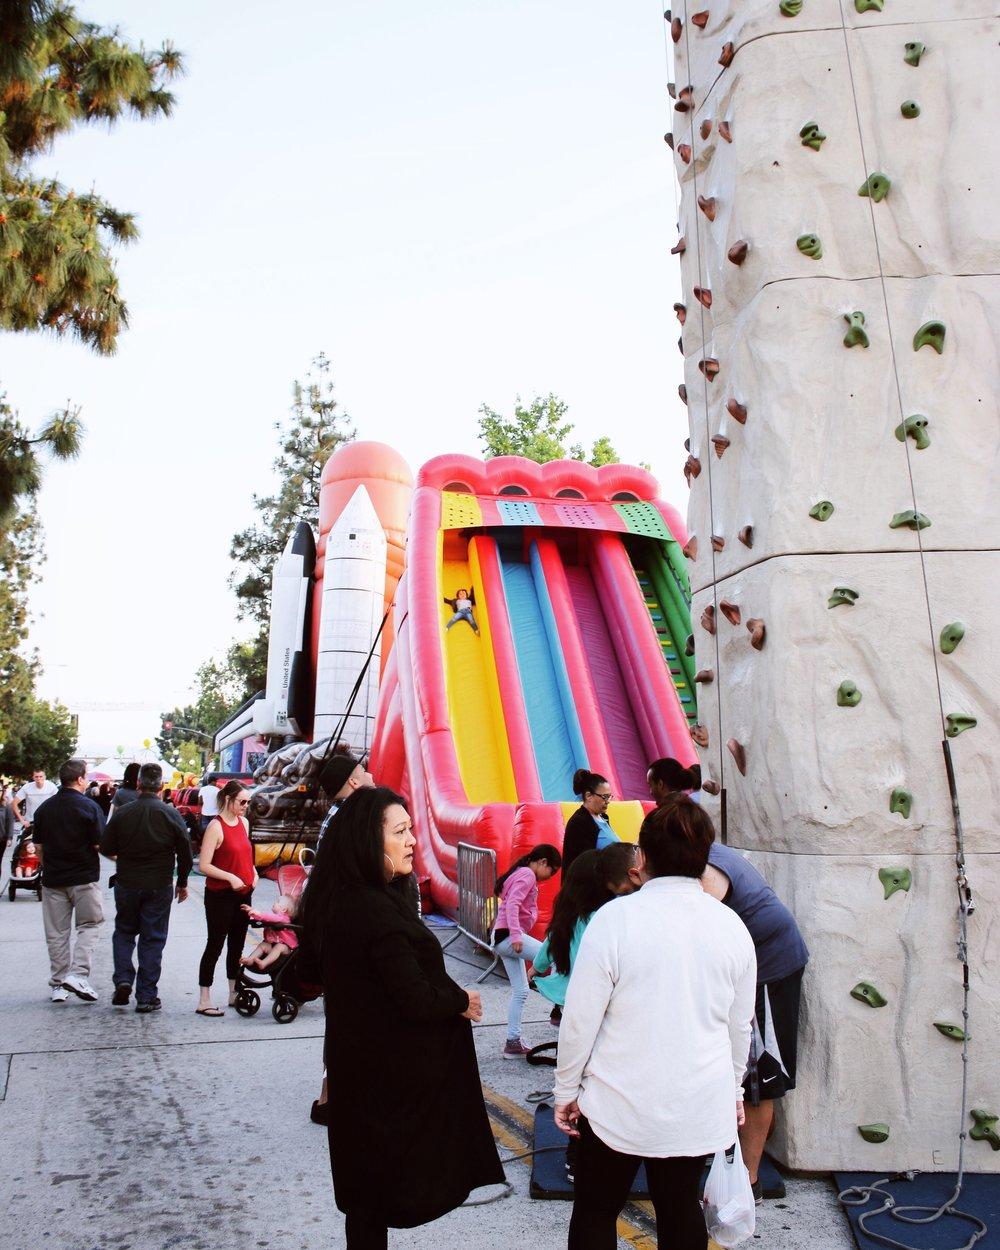 old-town-monrovia-street-fair-1